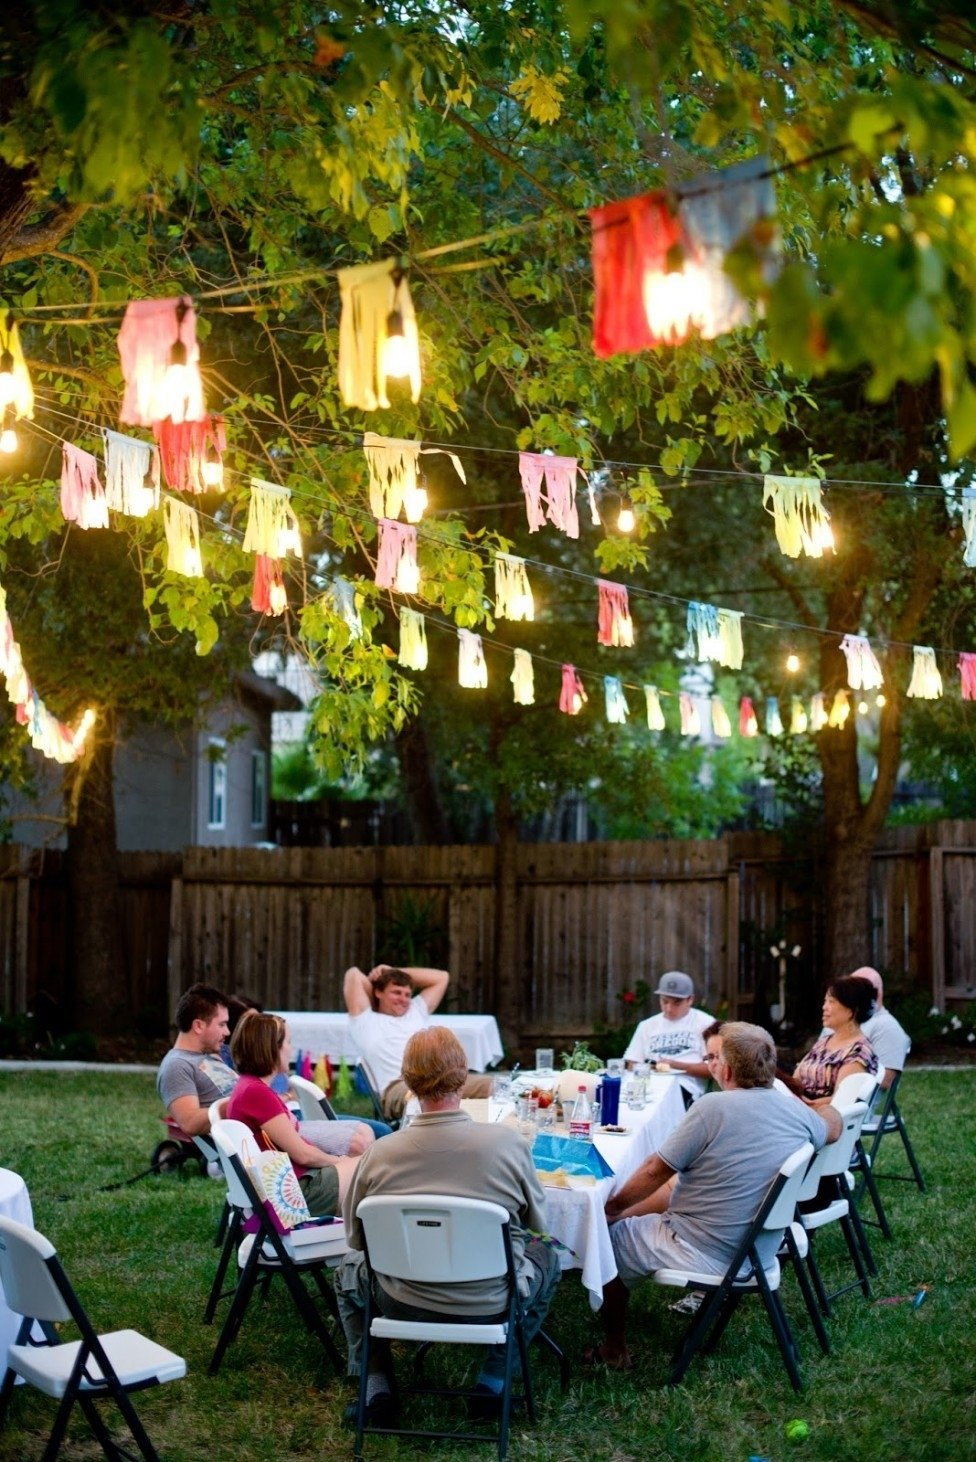 10 Stylish Backyard Birthday Party Ideas For Adults pinmalia myers on bonfire bohemian party pinterest 18th 1